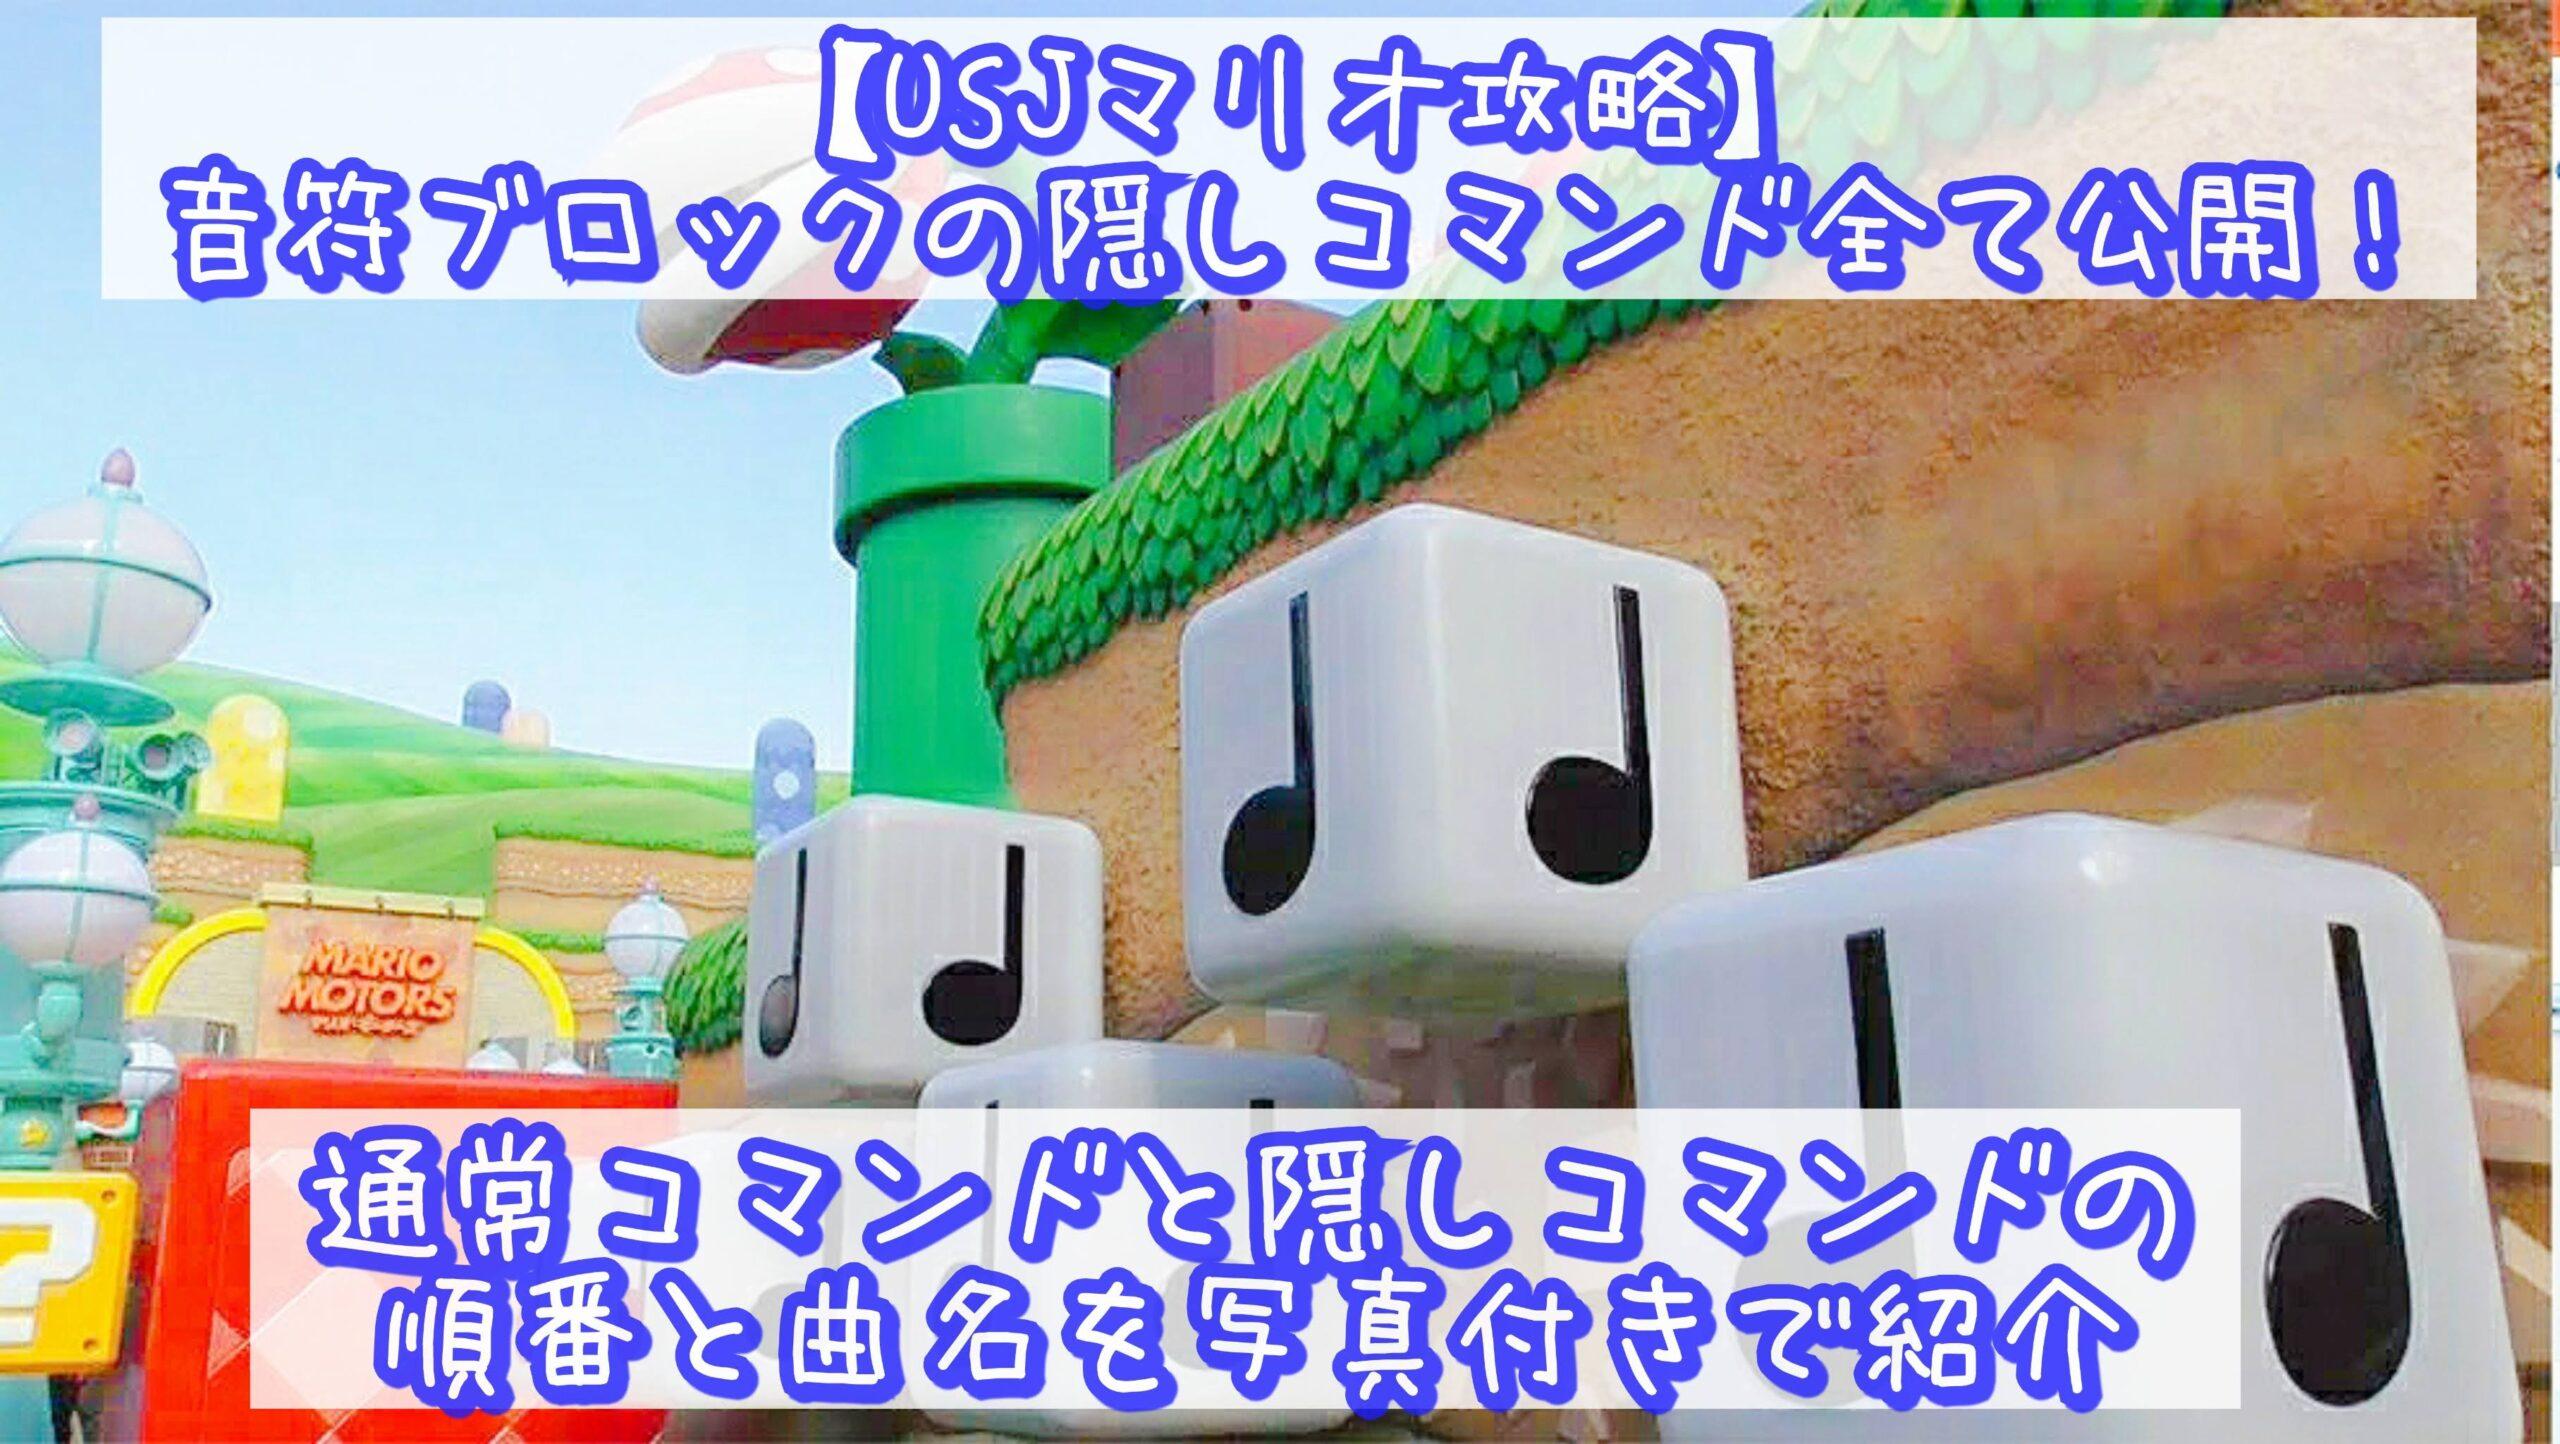 【USJマリオ攻略】音符ブロックの隠しコマンド全て公開!通常コマンドと隠しコマンドの順番と曲名を写真付きで紹介!